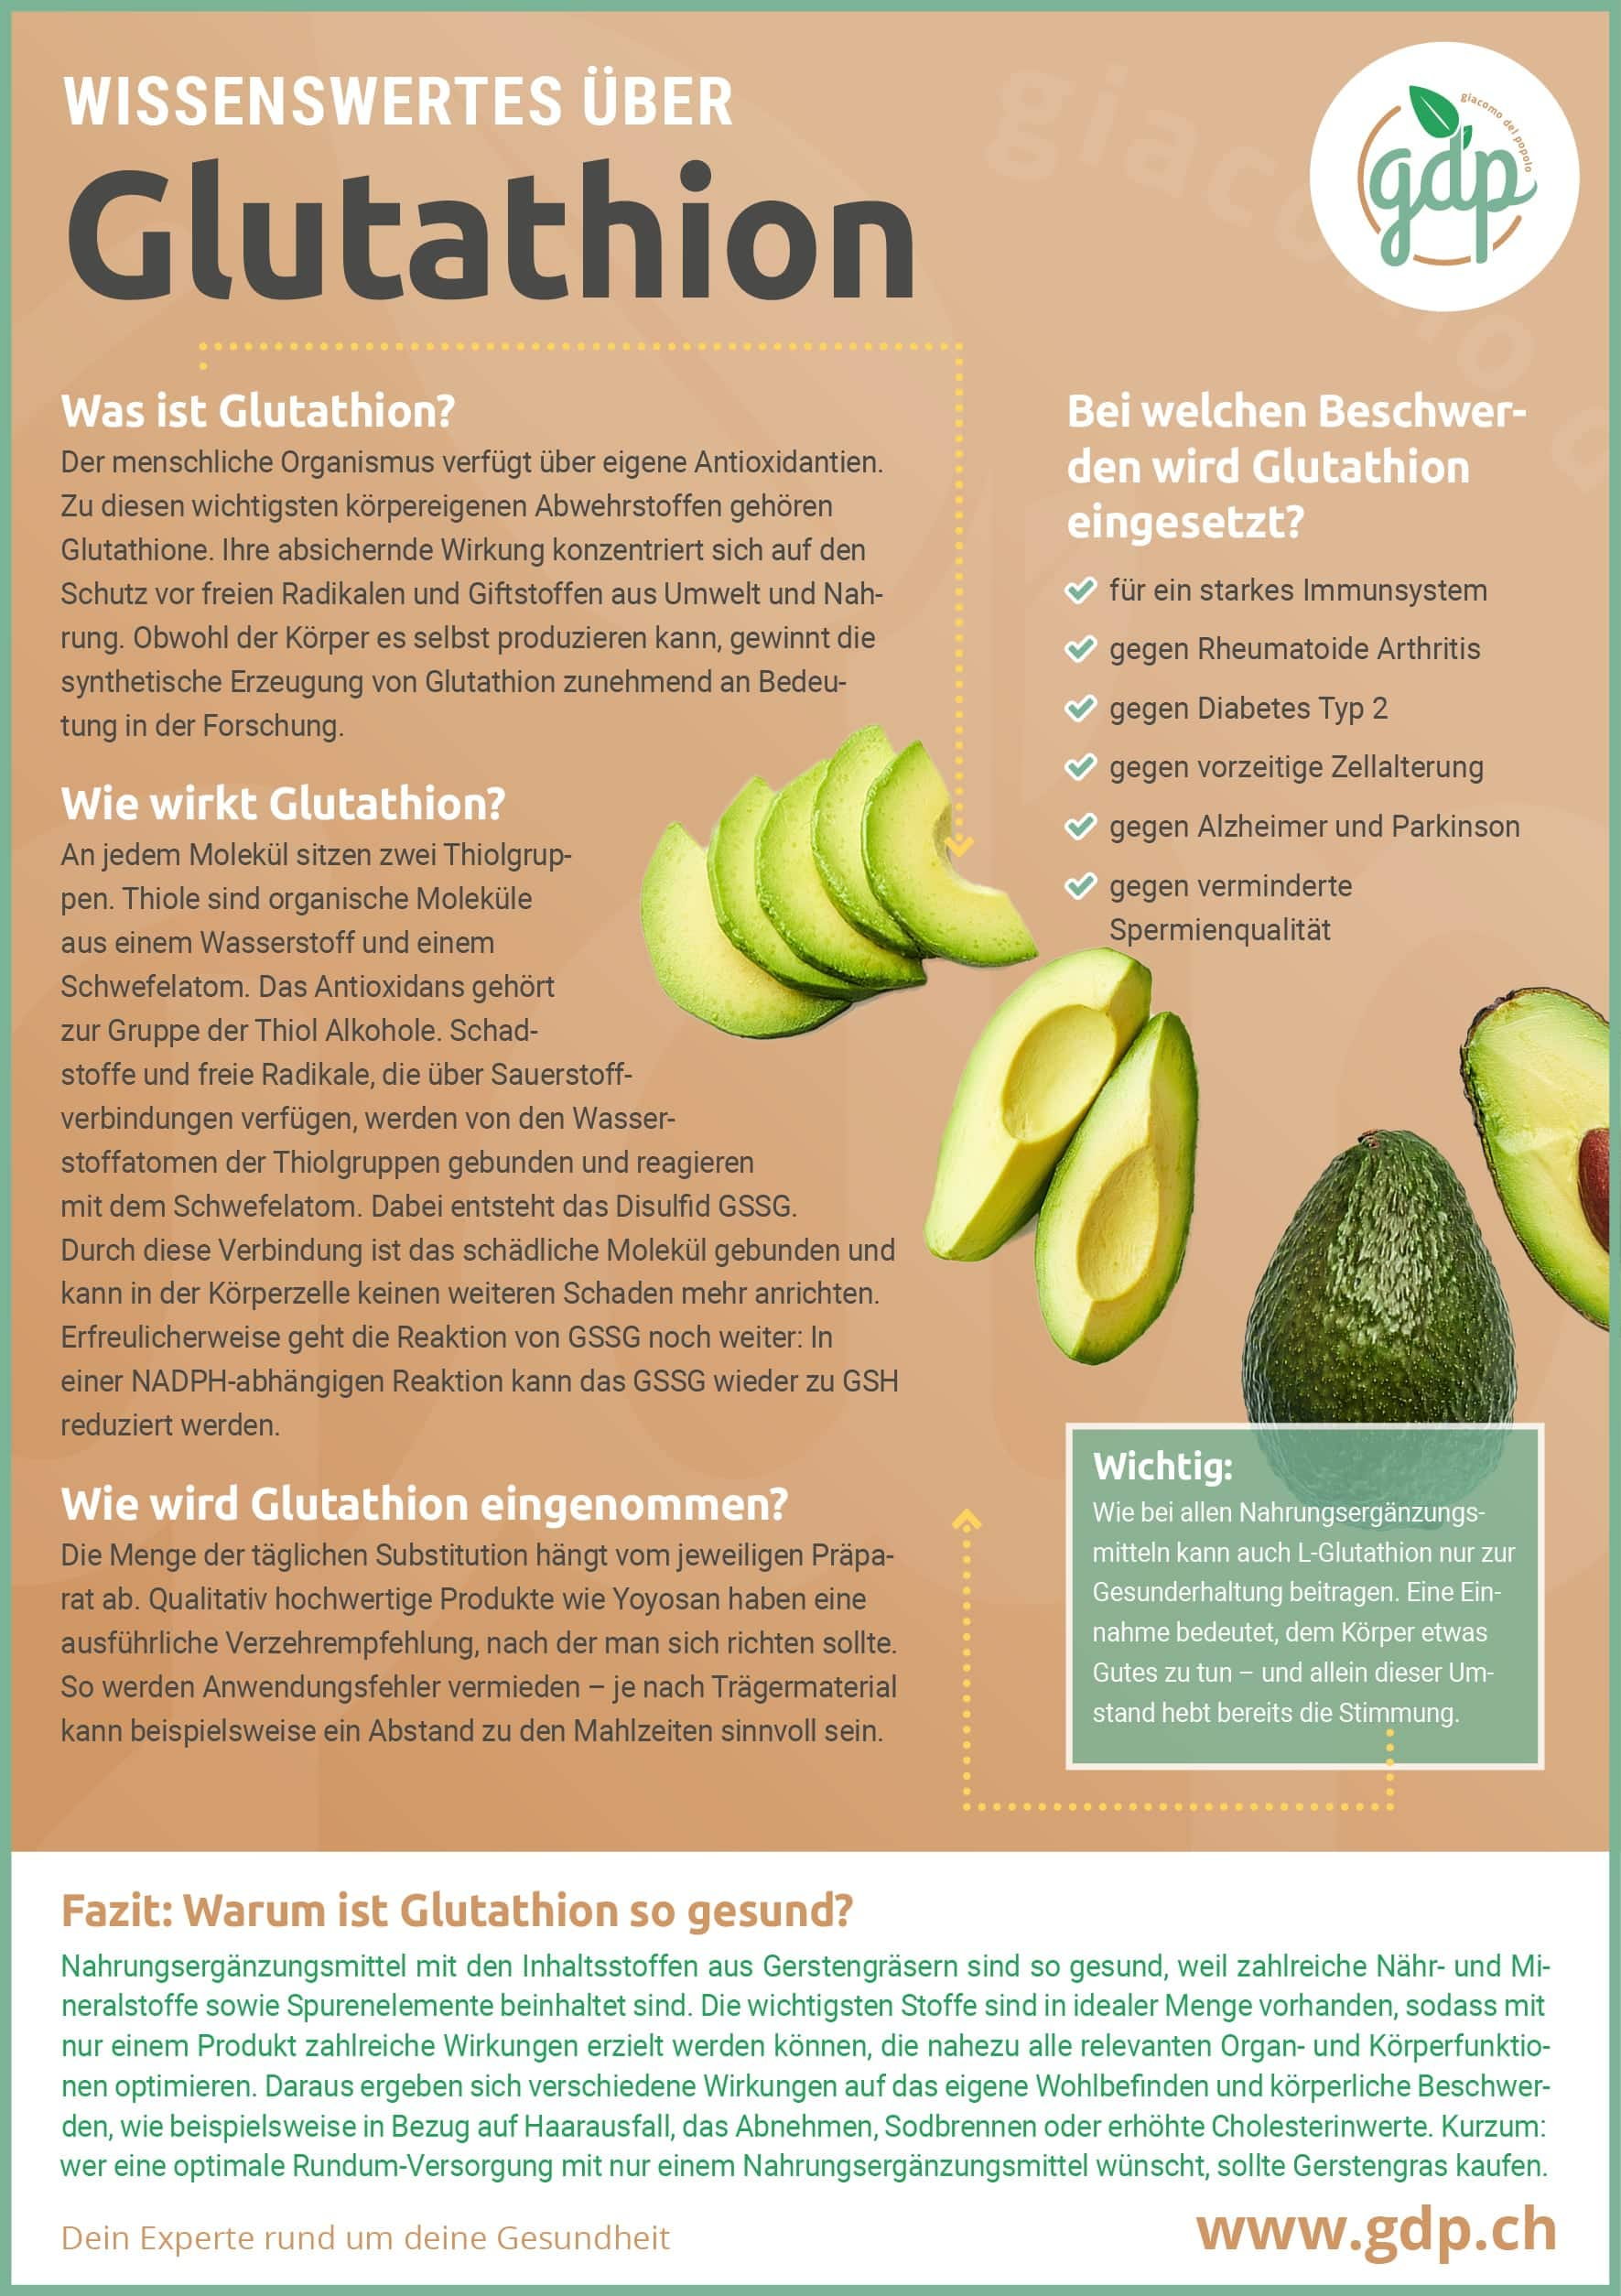 glutathion gdp infografik